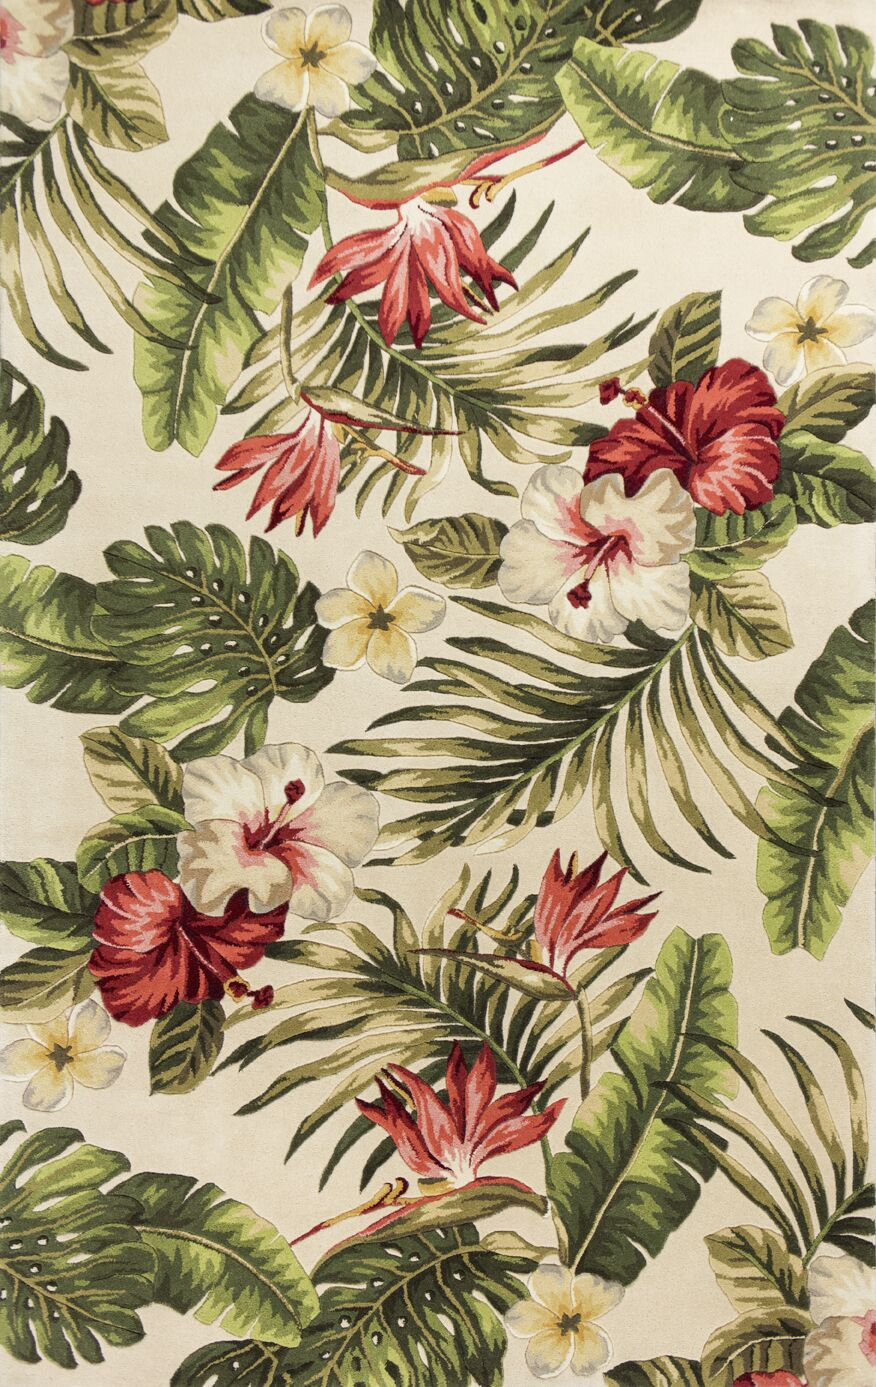 Roseleaf Hand-Tufted Multi-Colored Area Rug Rug Size: Rectangle 5' x 8'